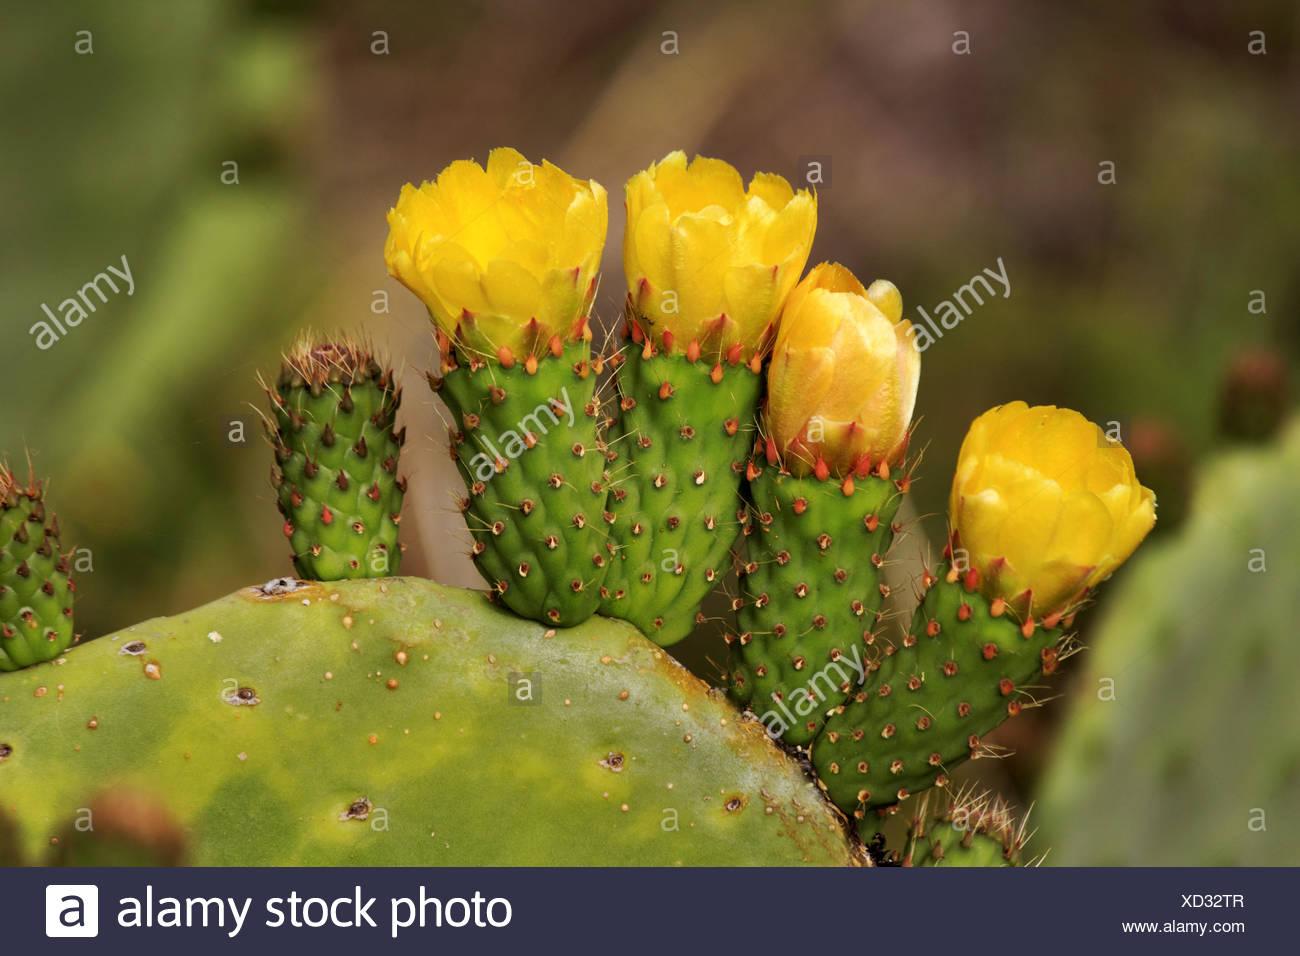 Yellow flowering cactus stock photos yellow flowering cactus stock indian fig cactus pear opuntia ficus indica opuntia ficus barbarica mightylinksfo Images